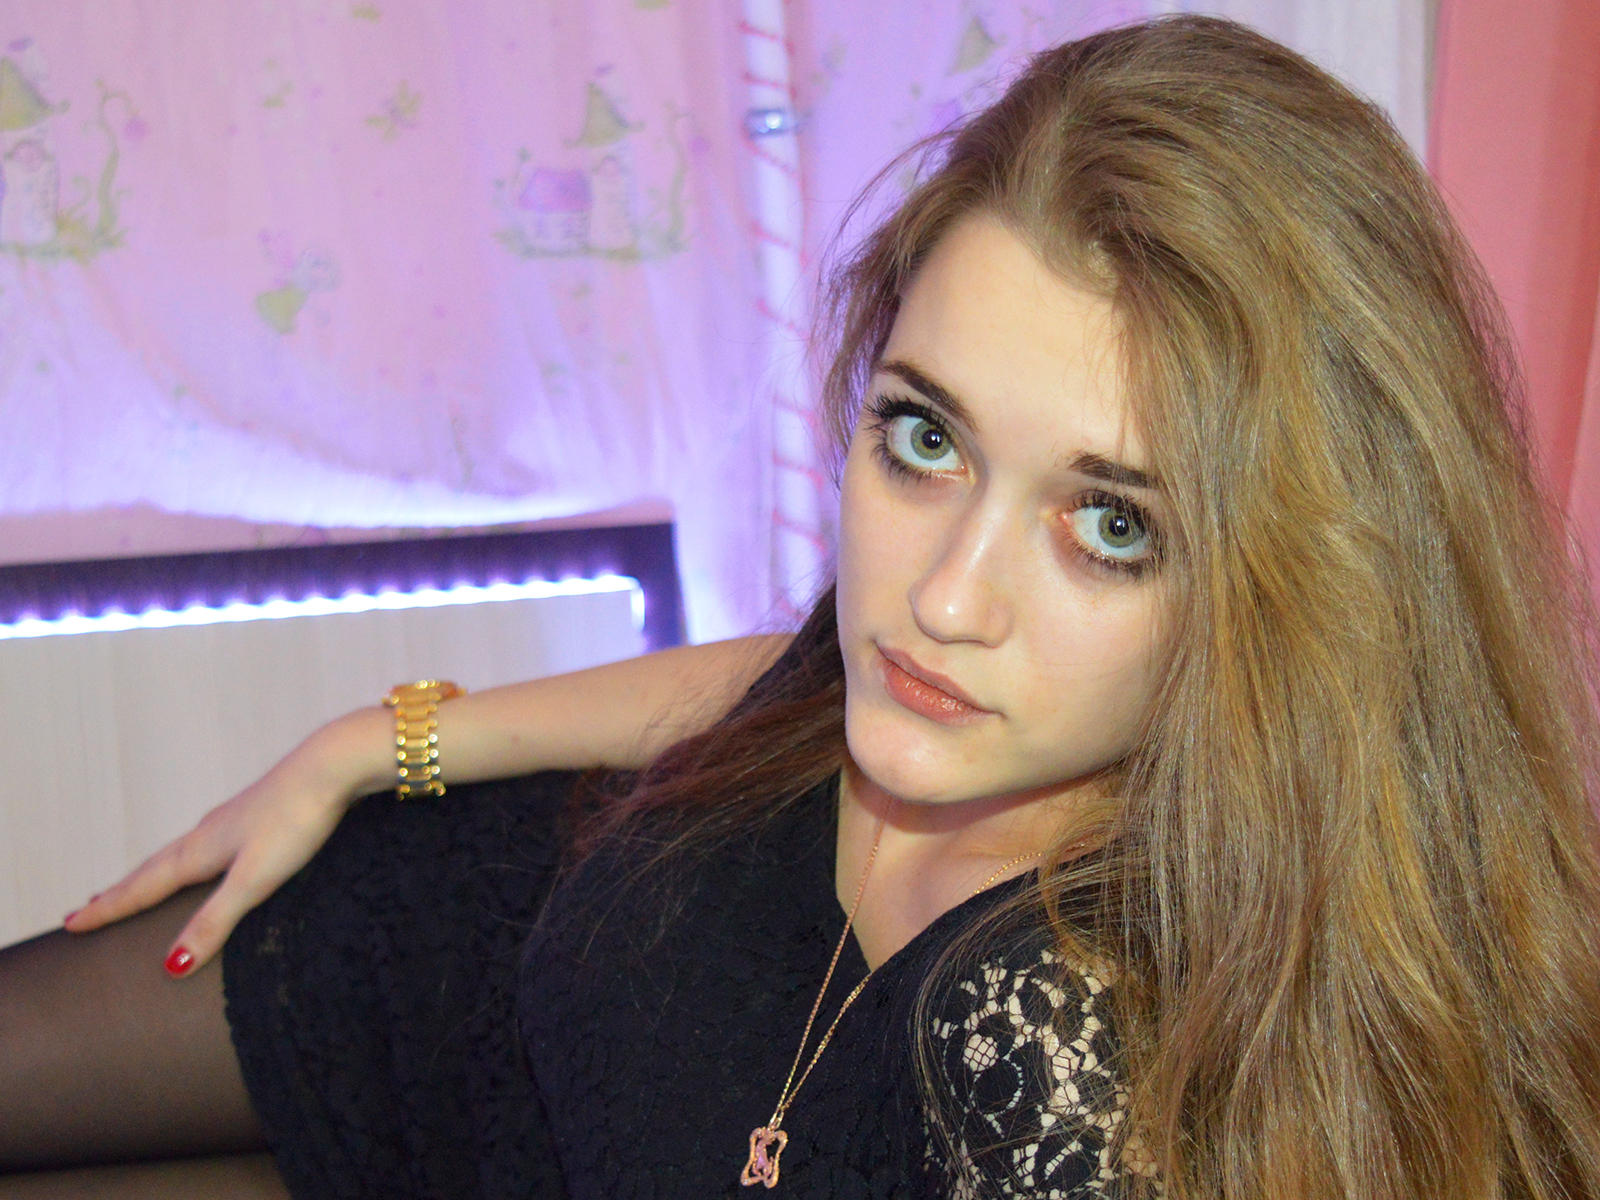 Russian cam model Tina_DOUS0N